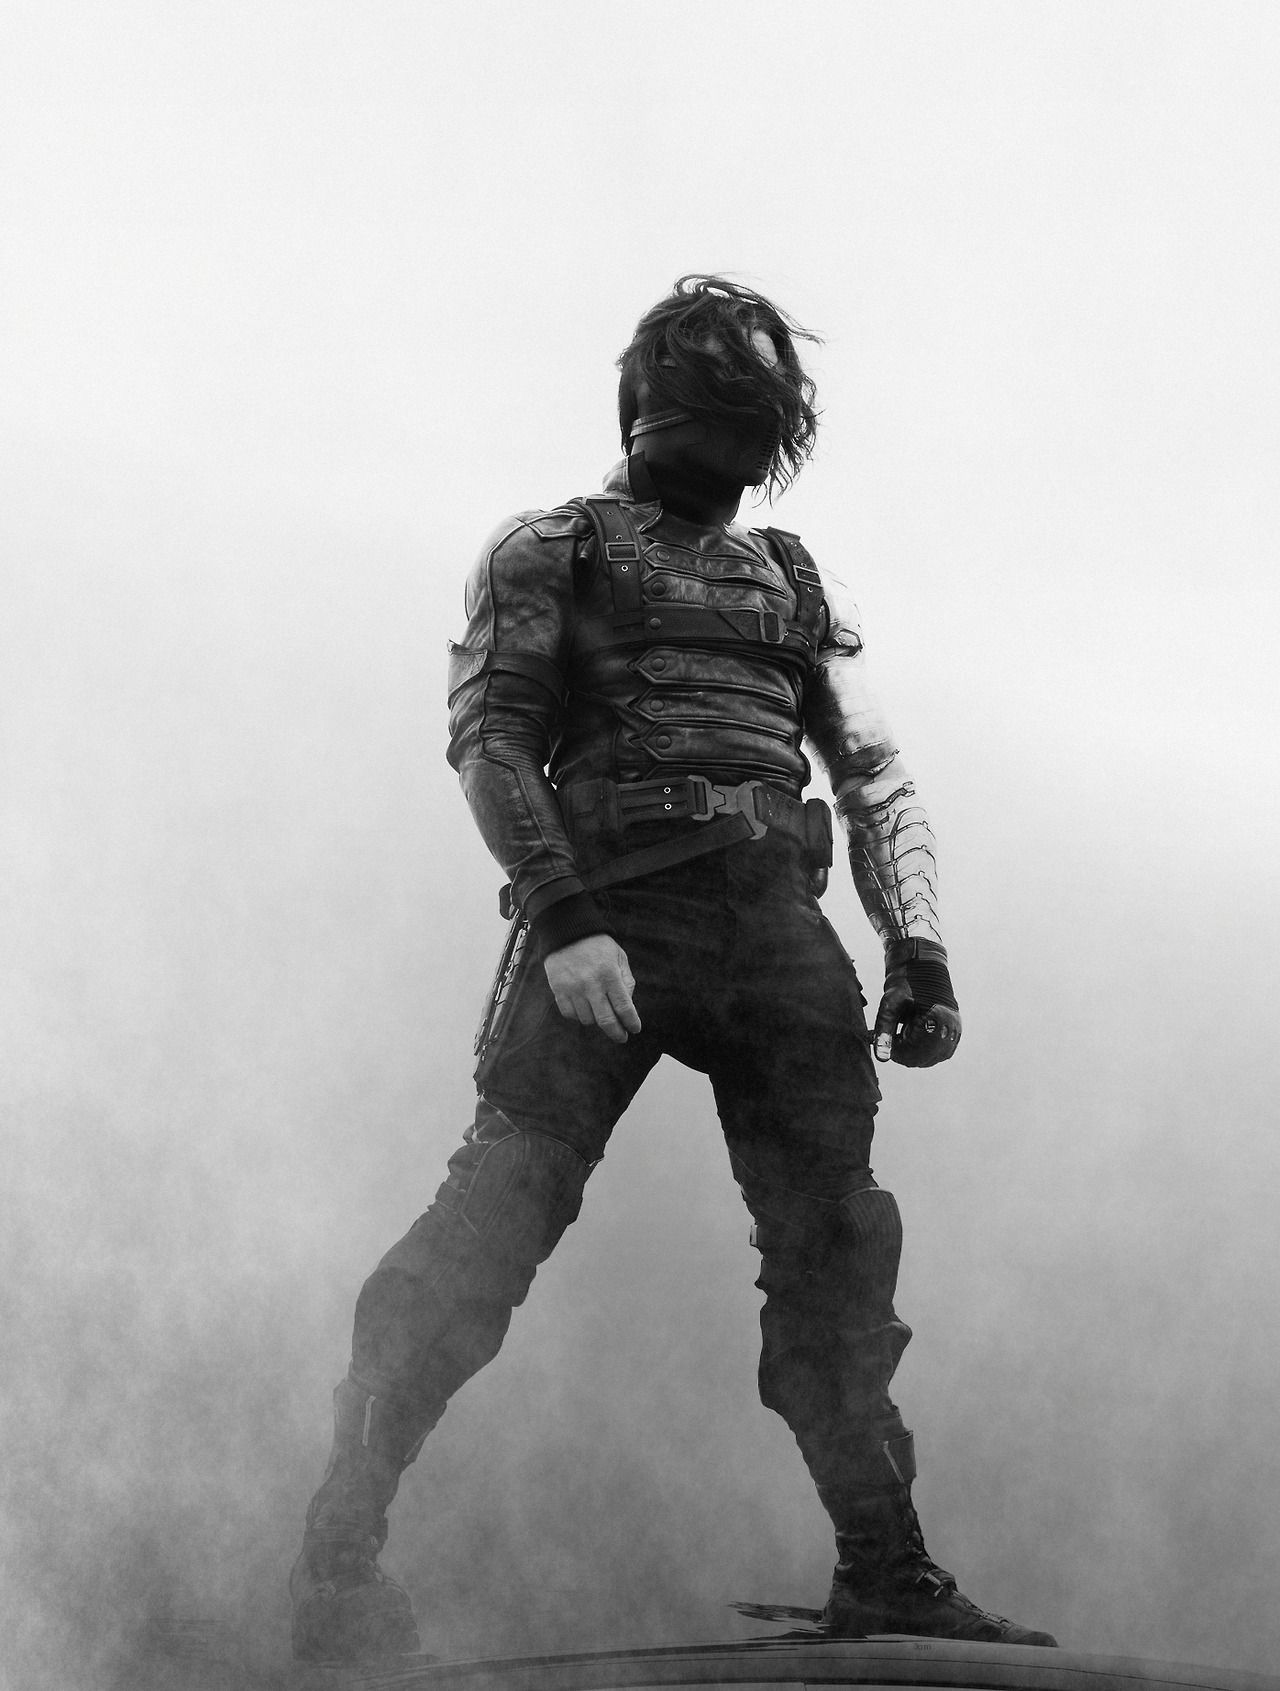 Original Still From Stitchkingdom Female Winter Soldier Short Hair Costume Bucky Barnes Fanfiction Bucky Winter Soldier